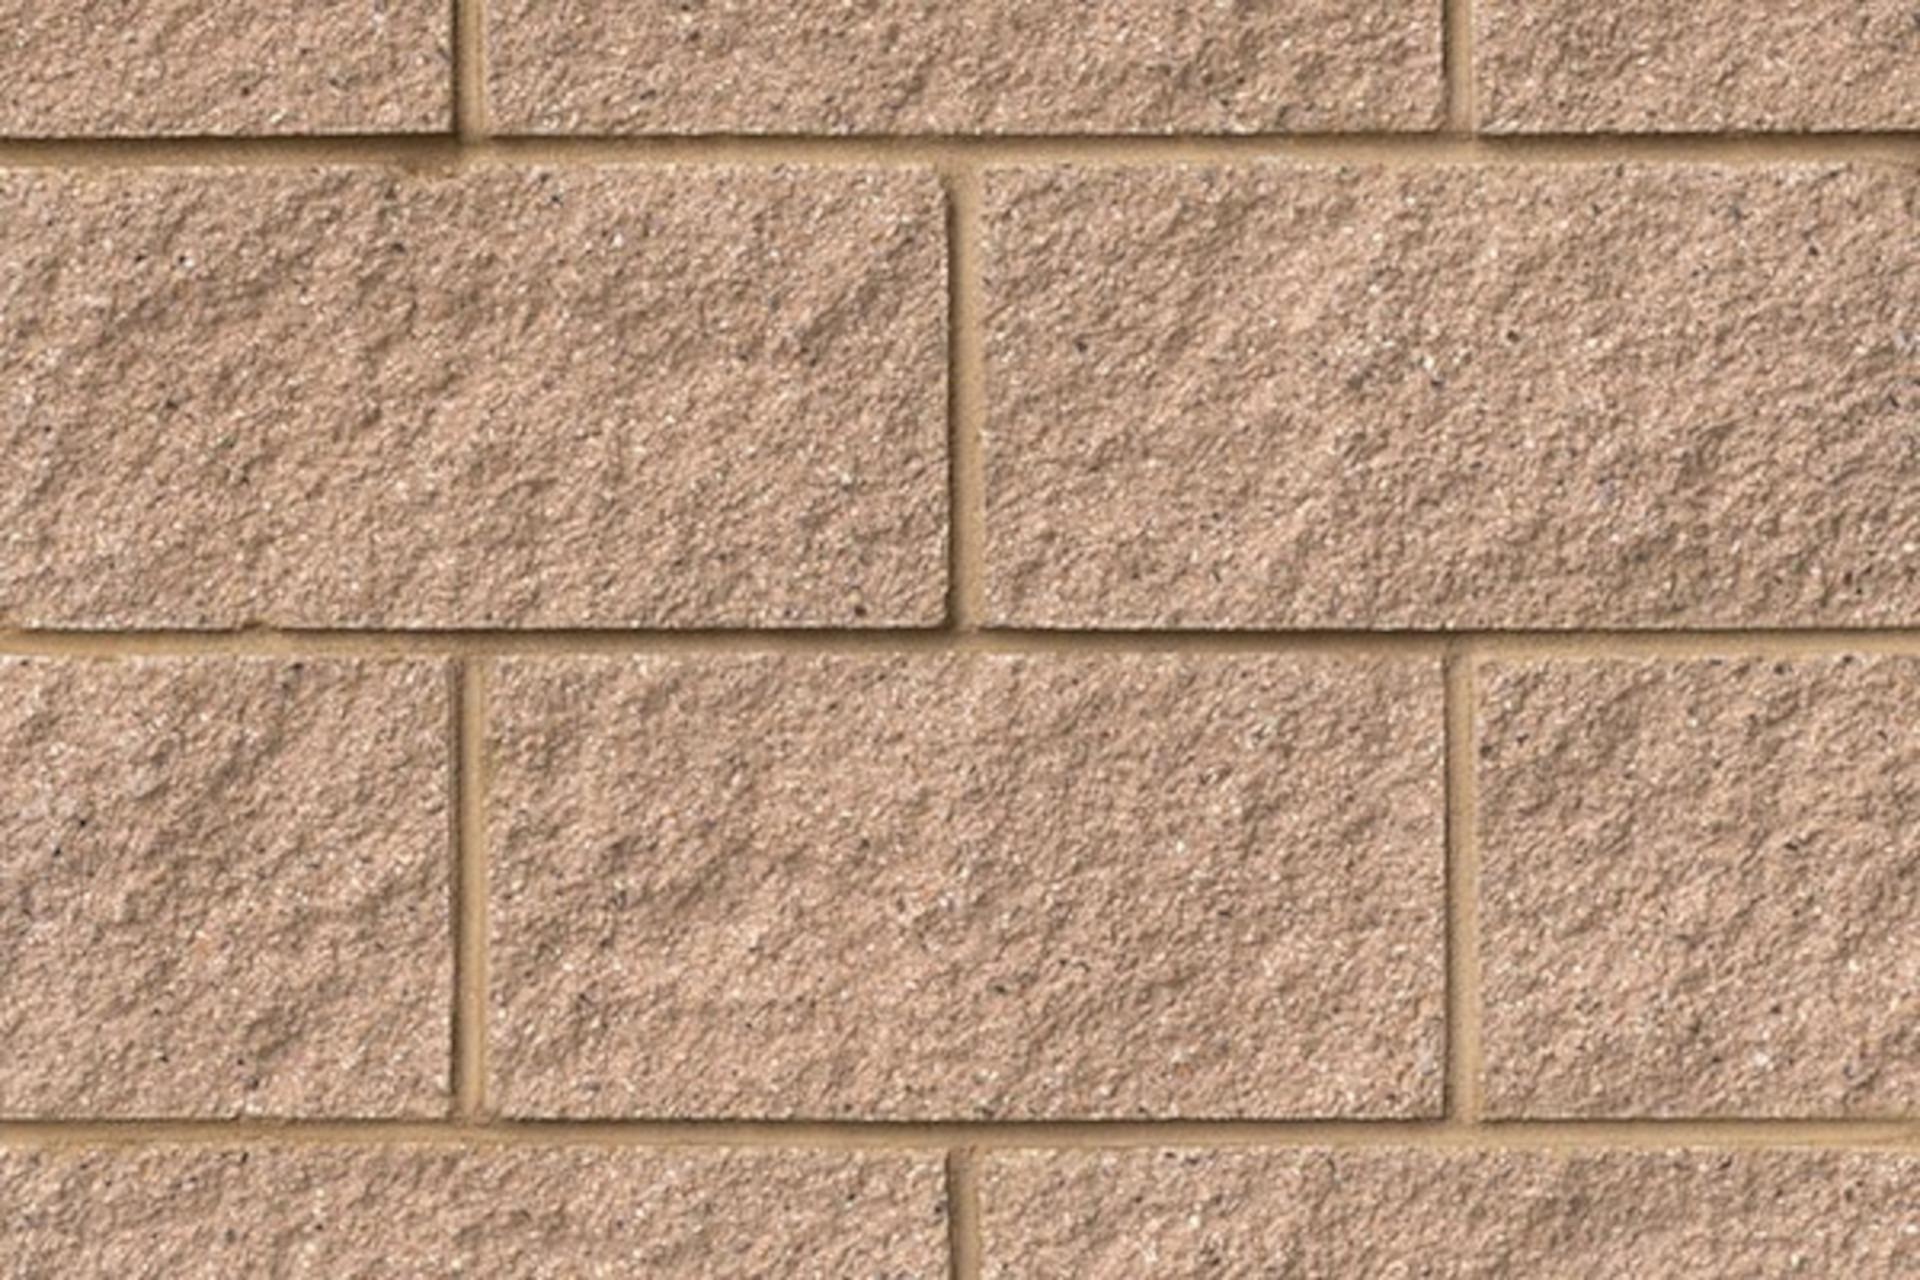 120 Brownwood Concrete Block